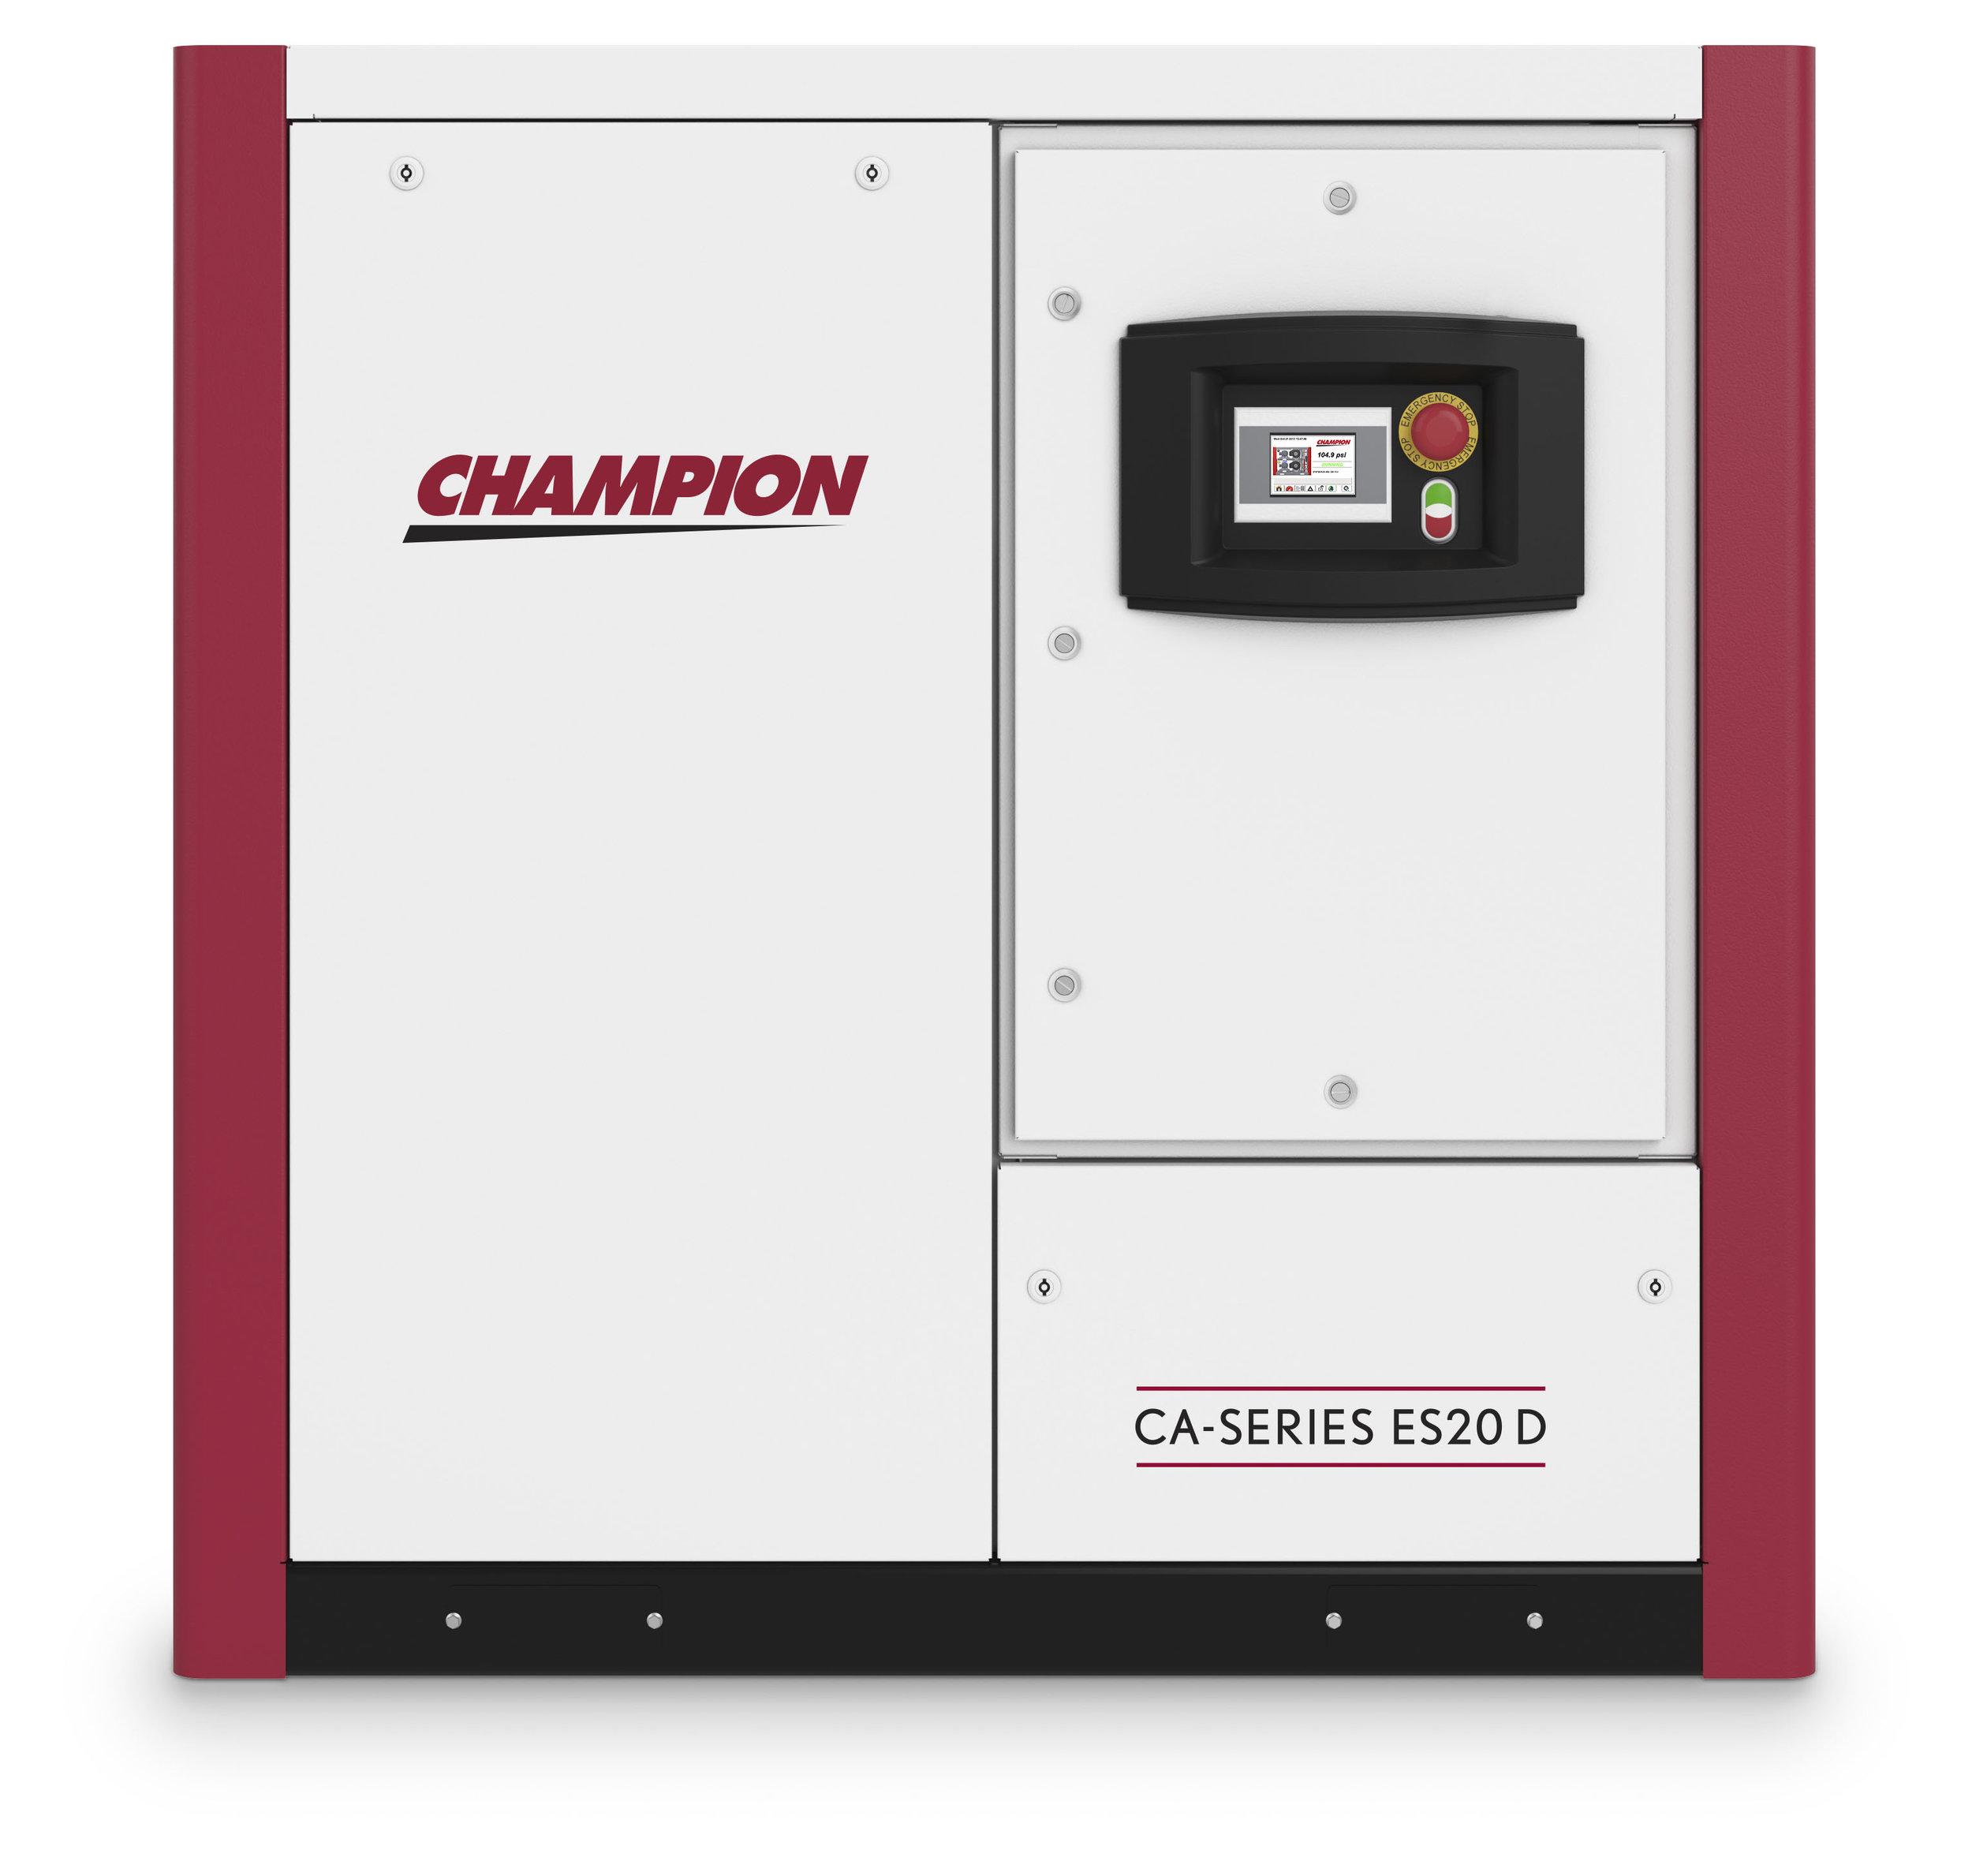 SLS_Duplex_ClosedRed_fv2_Champion CA ES20D.jpg